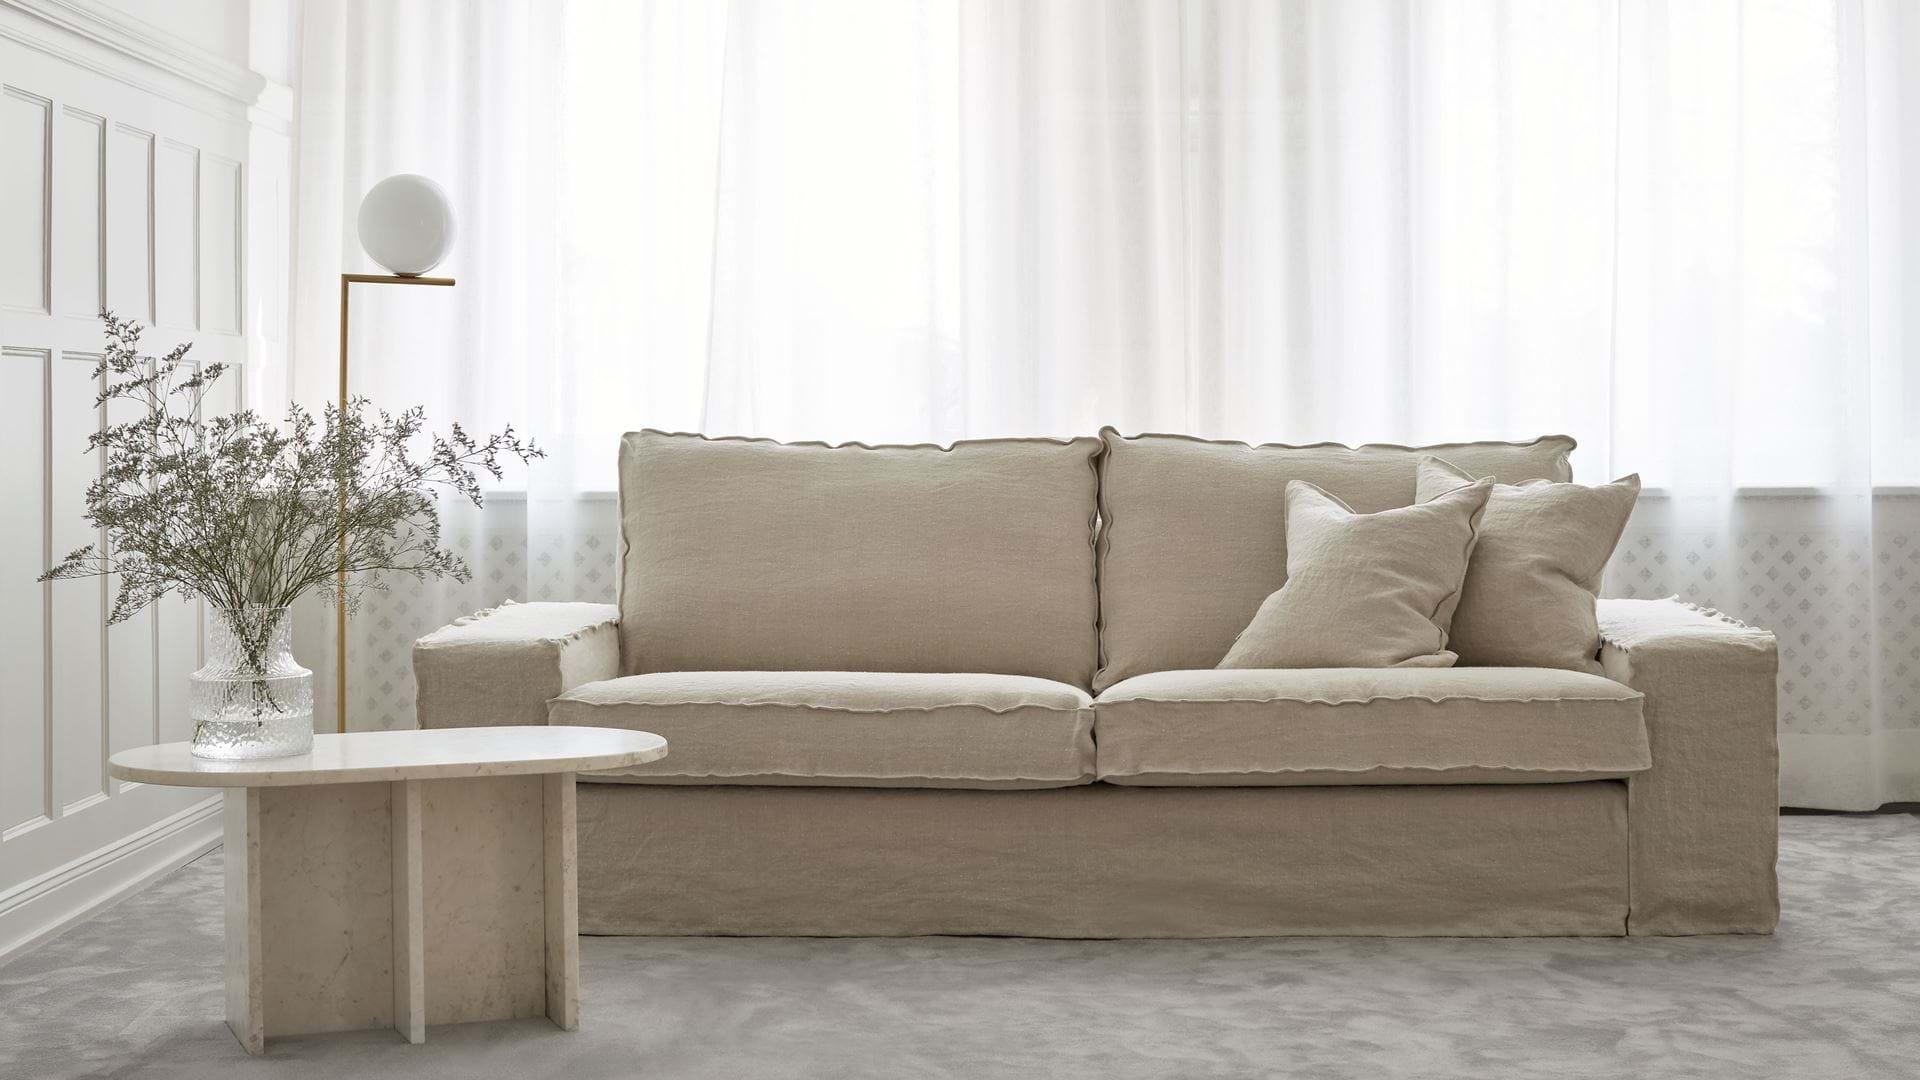 Ikea Kivik 3 Seater Sofa Cover Loose